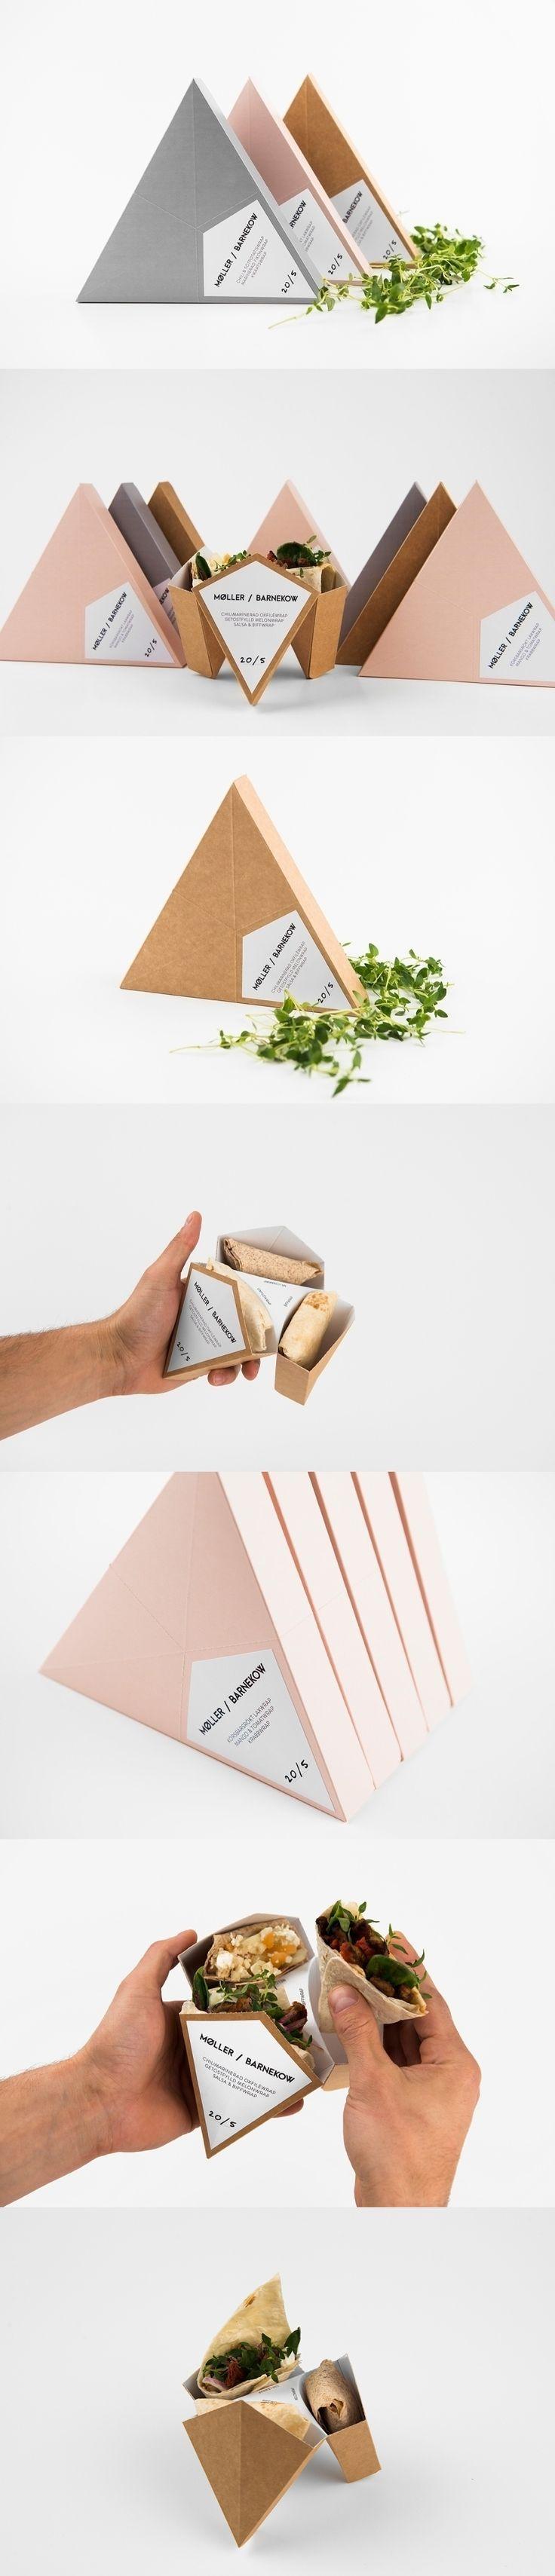 Moller Barnekow. The most elegant sandwich wrap. (More design inspiration at www.aldenchong.com)